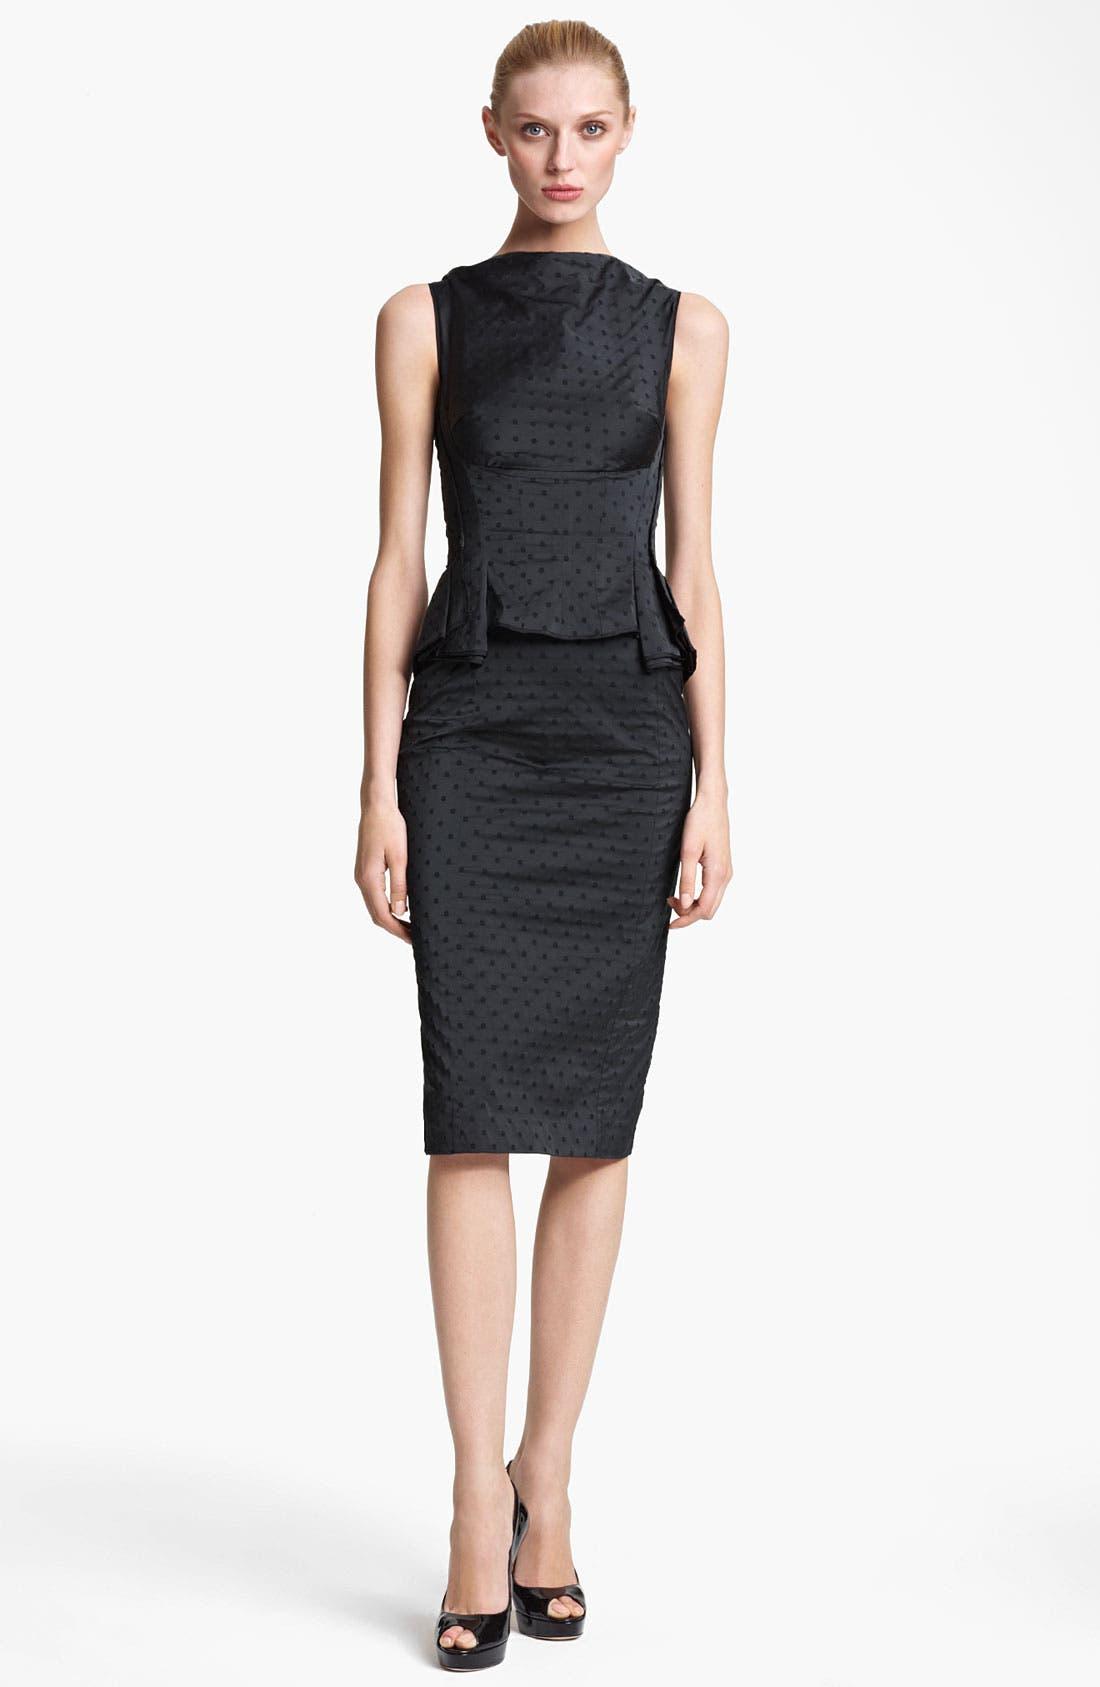 Alternate Image 1 Selected - Nina Ricci Jacquard Peplum Dress